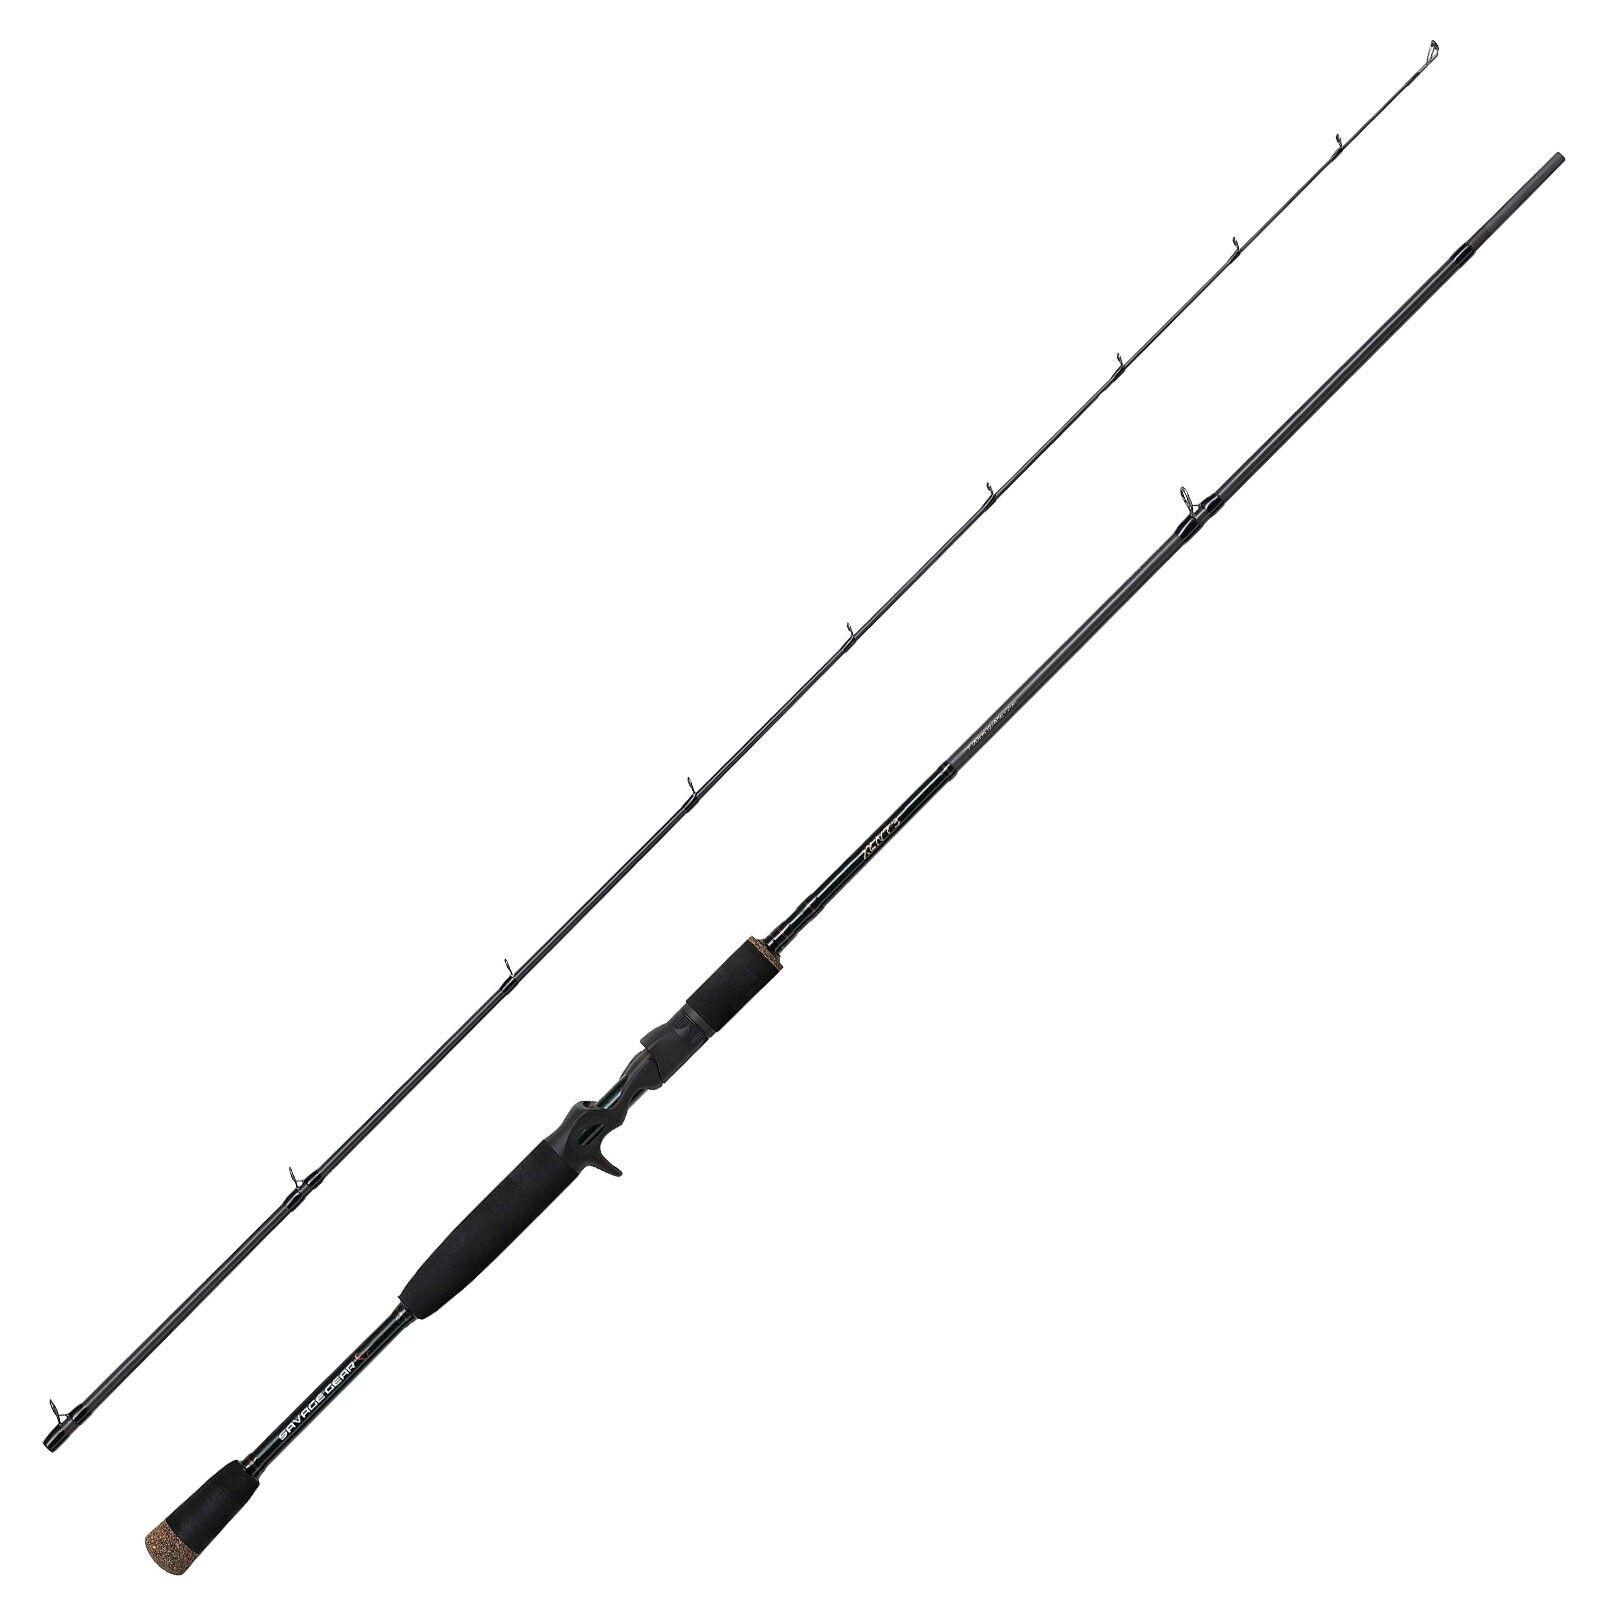 Savage Gear baitcastrute – XLNT trigger 3 8ft3in 2,51m 150g 2 pezzi